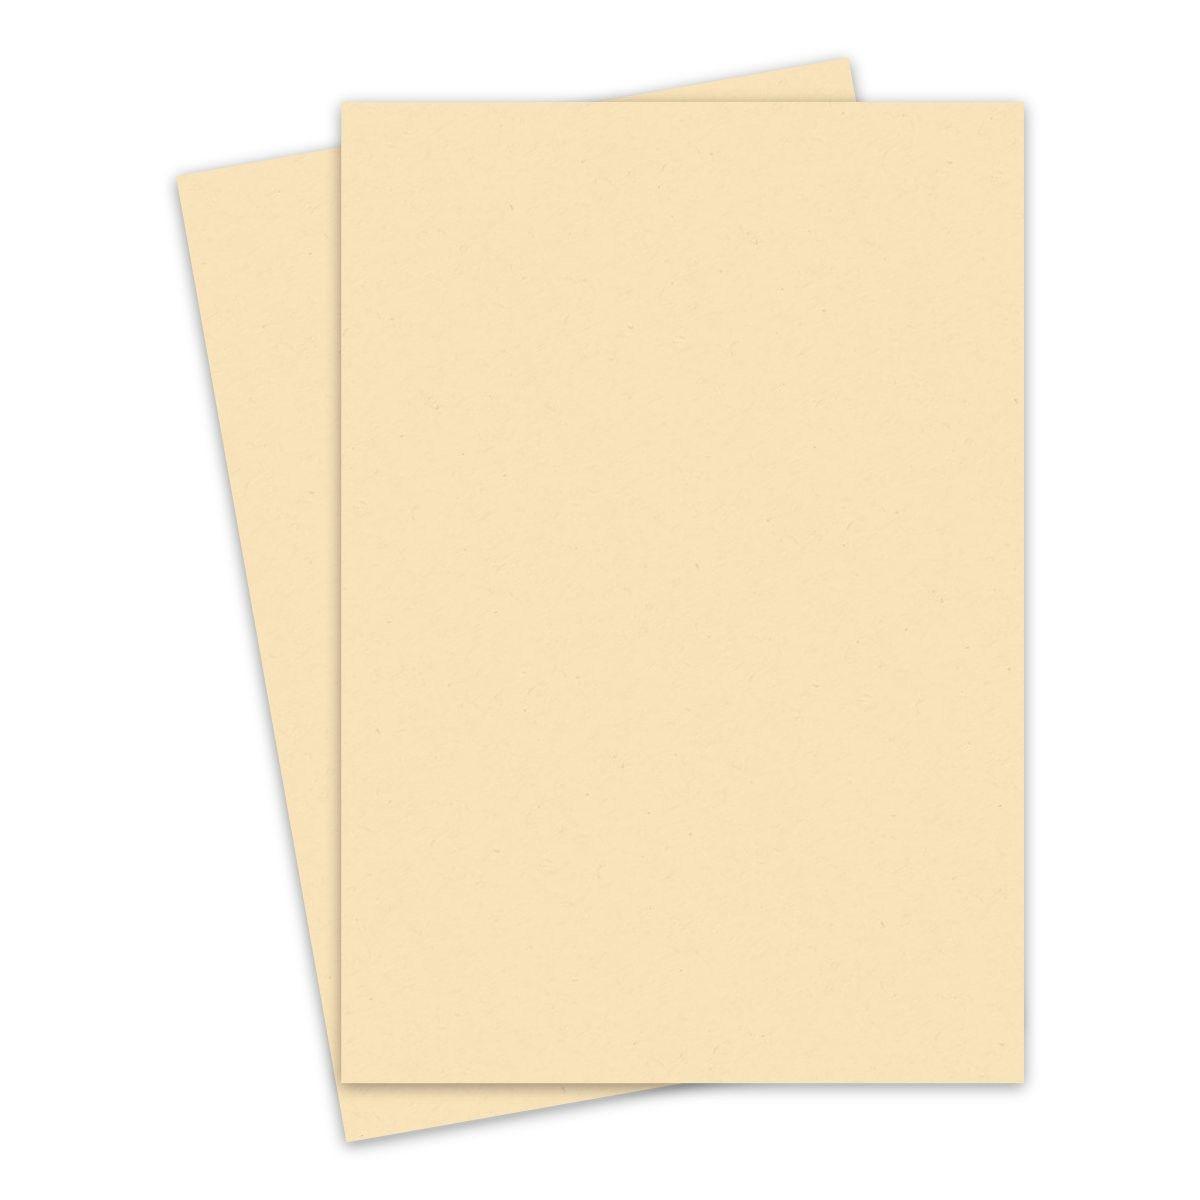 KRAFT-TONE Manila Yellow Kraft Cardstock Paper- 5.5 x 5 Legal Size - 5lb  Cover - 5 PK